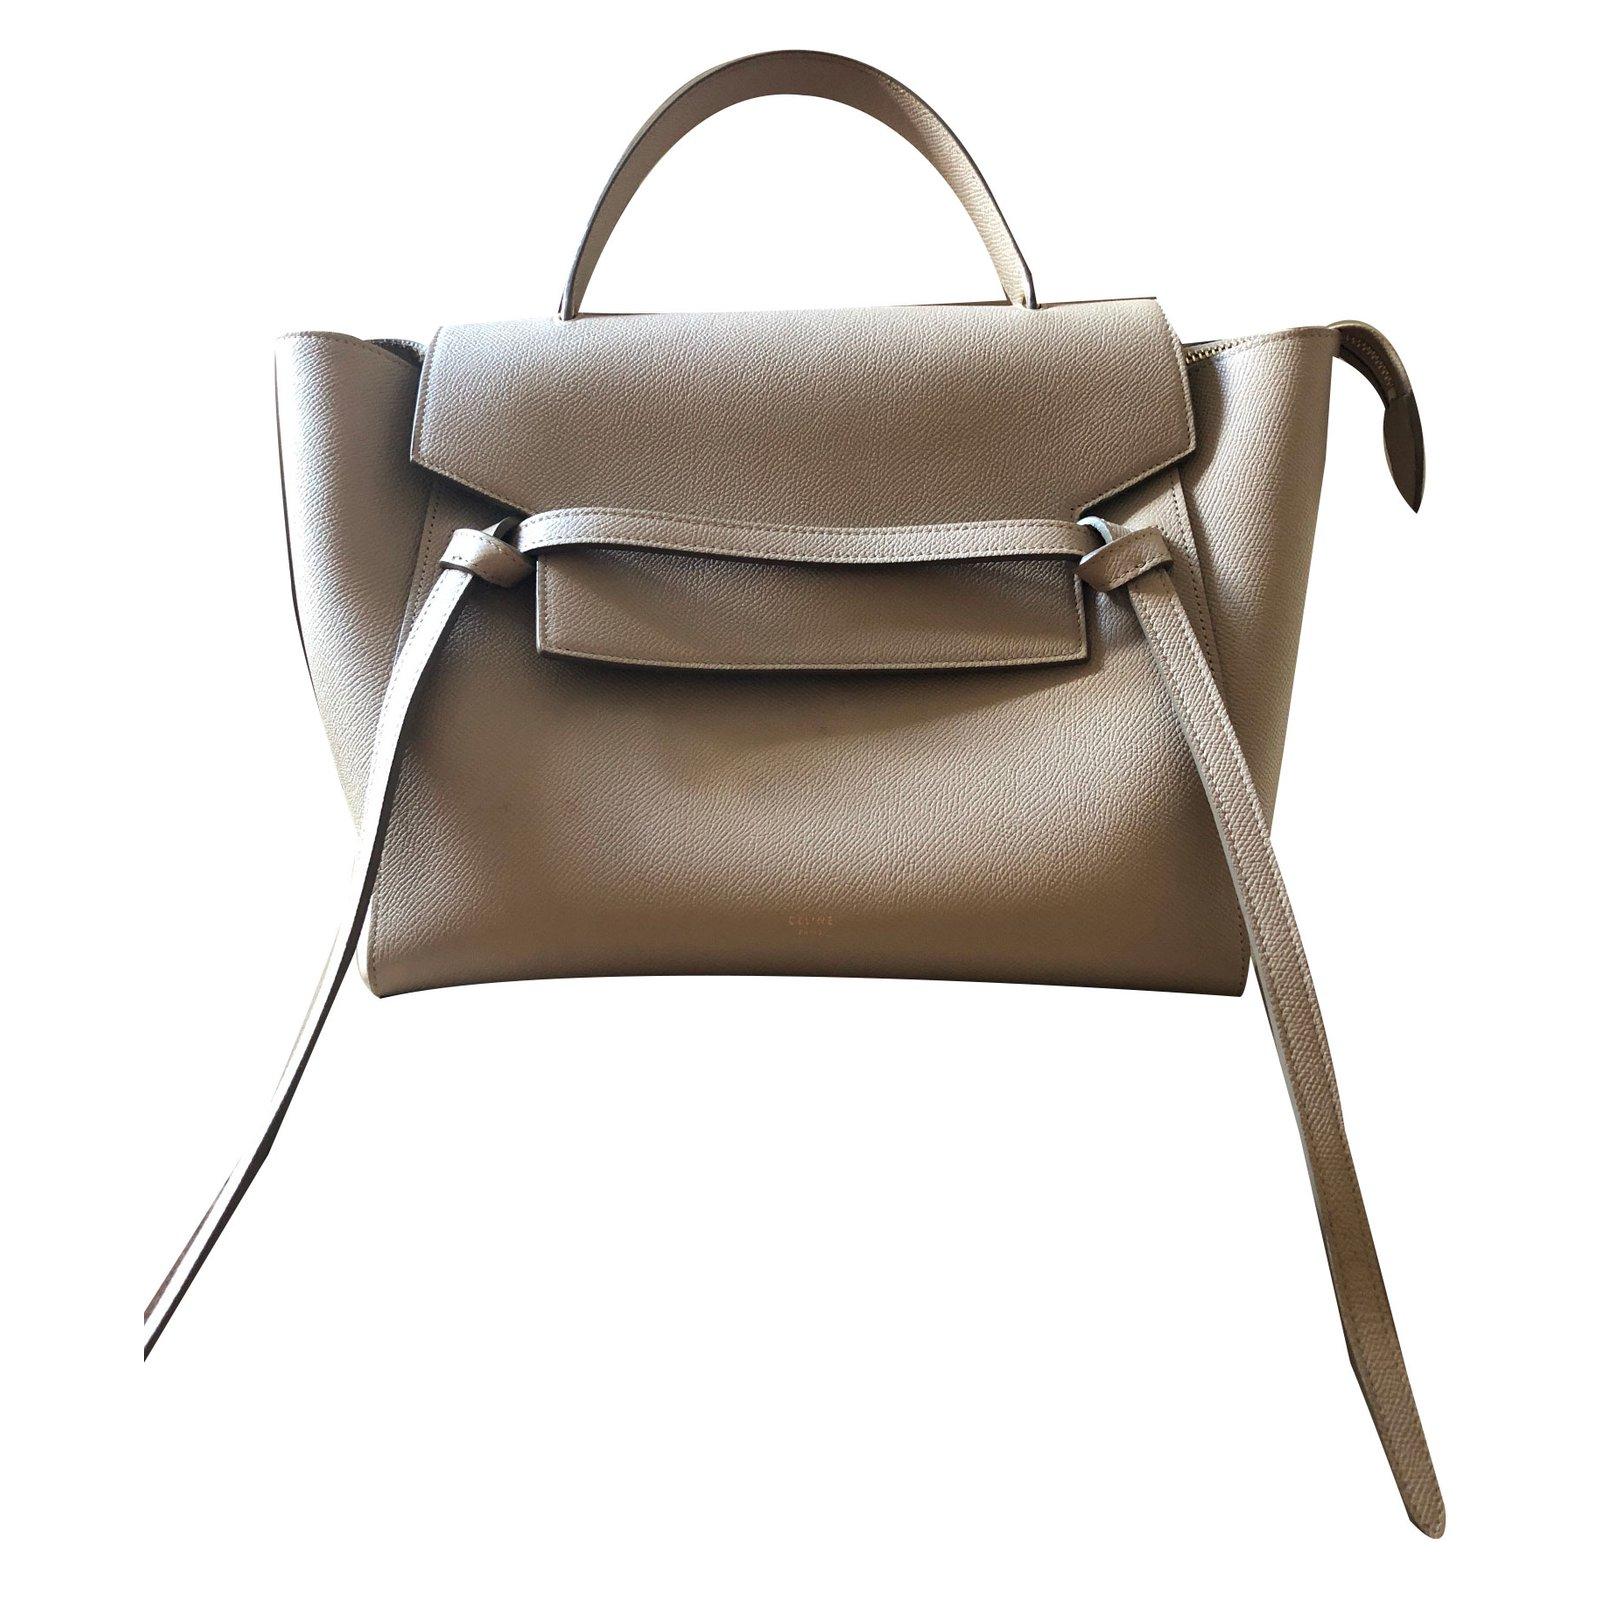 07081c6fcab4 céline mini belt handbags leather red ref.57177 uk availability 65080 50000